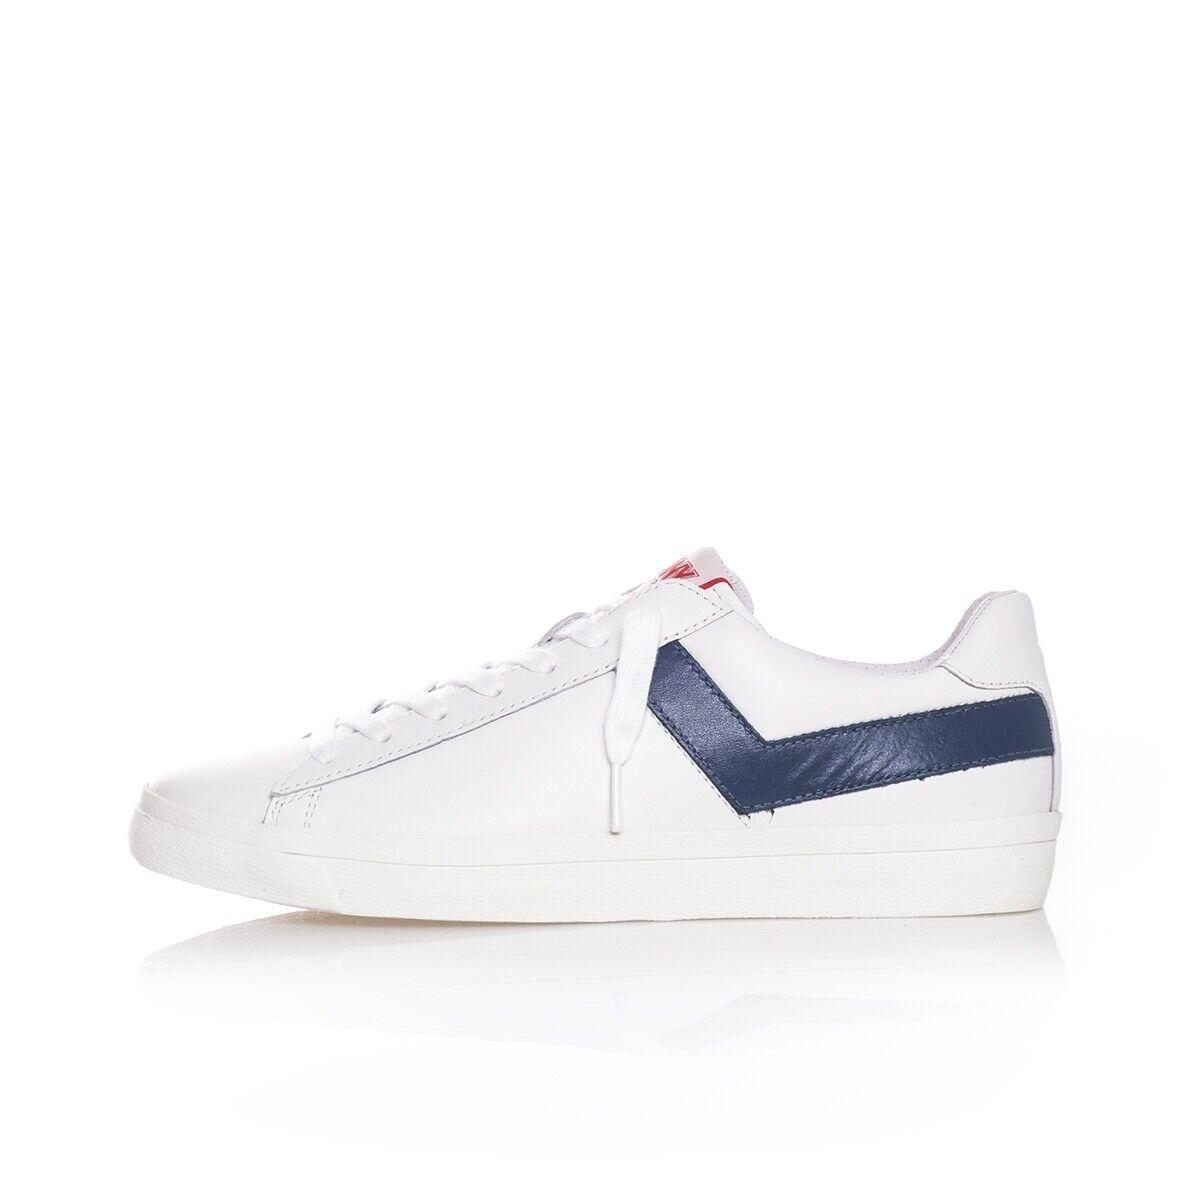 Zapatos Hombre Pony Top Star 634A.DK3